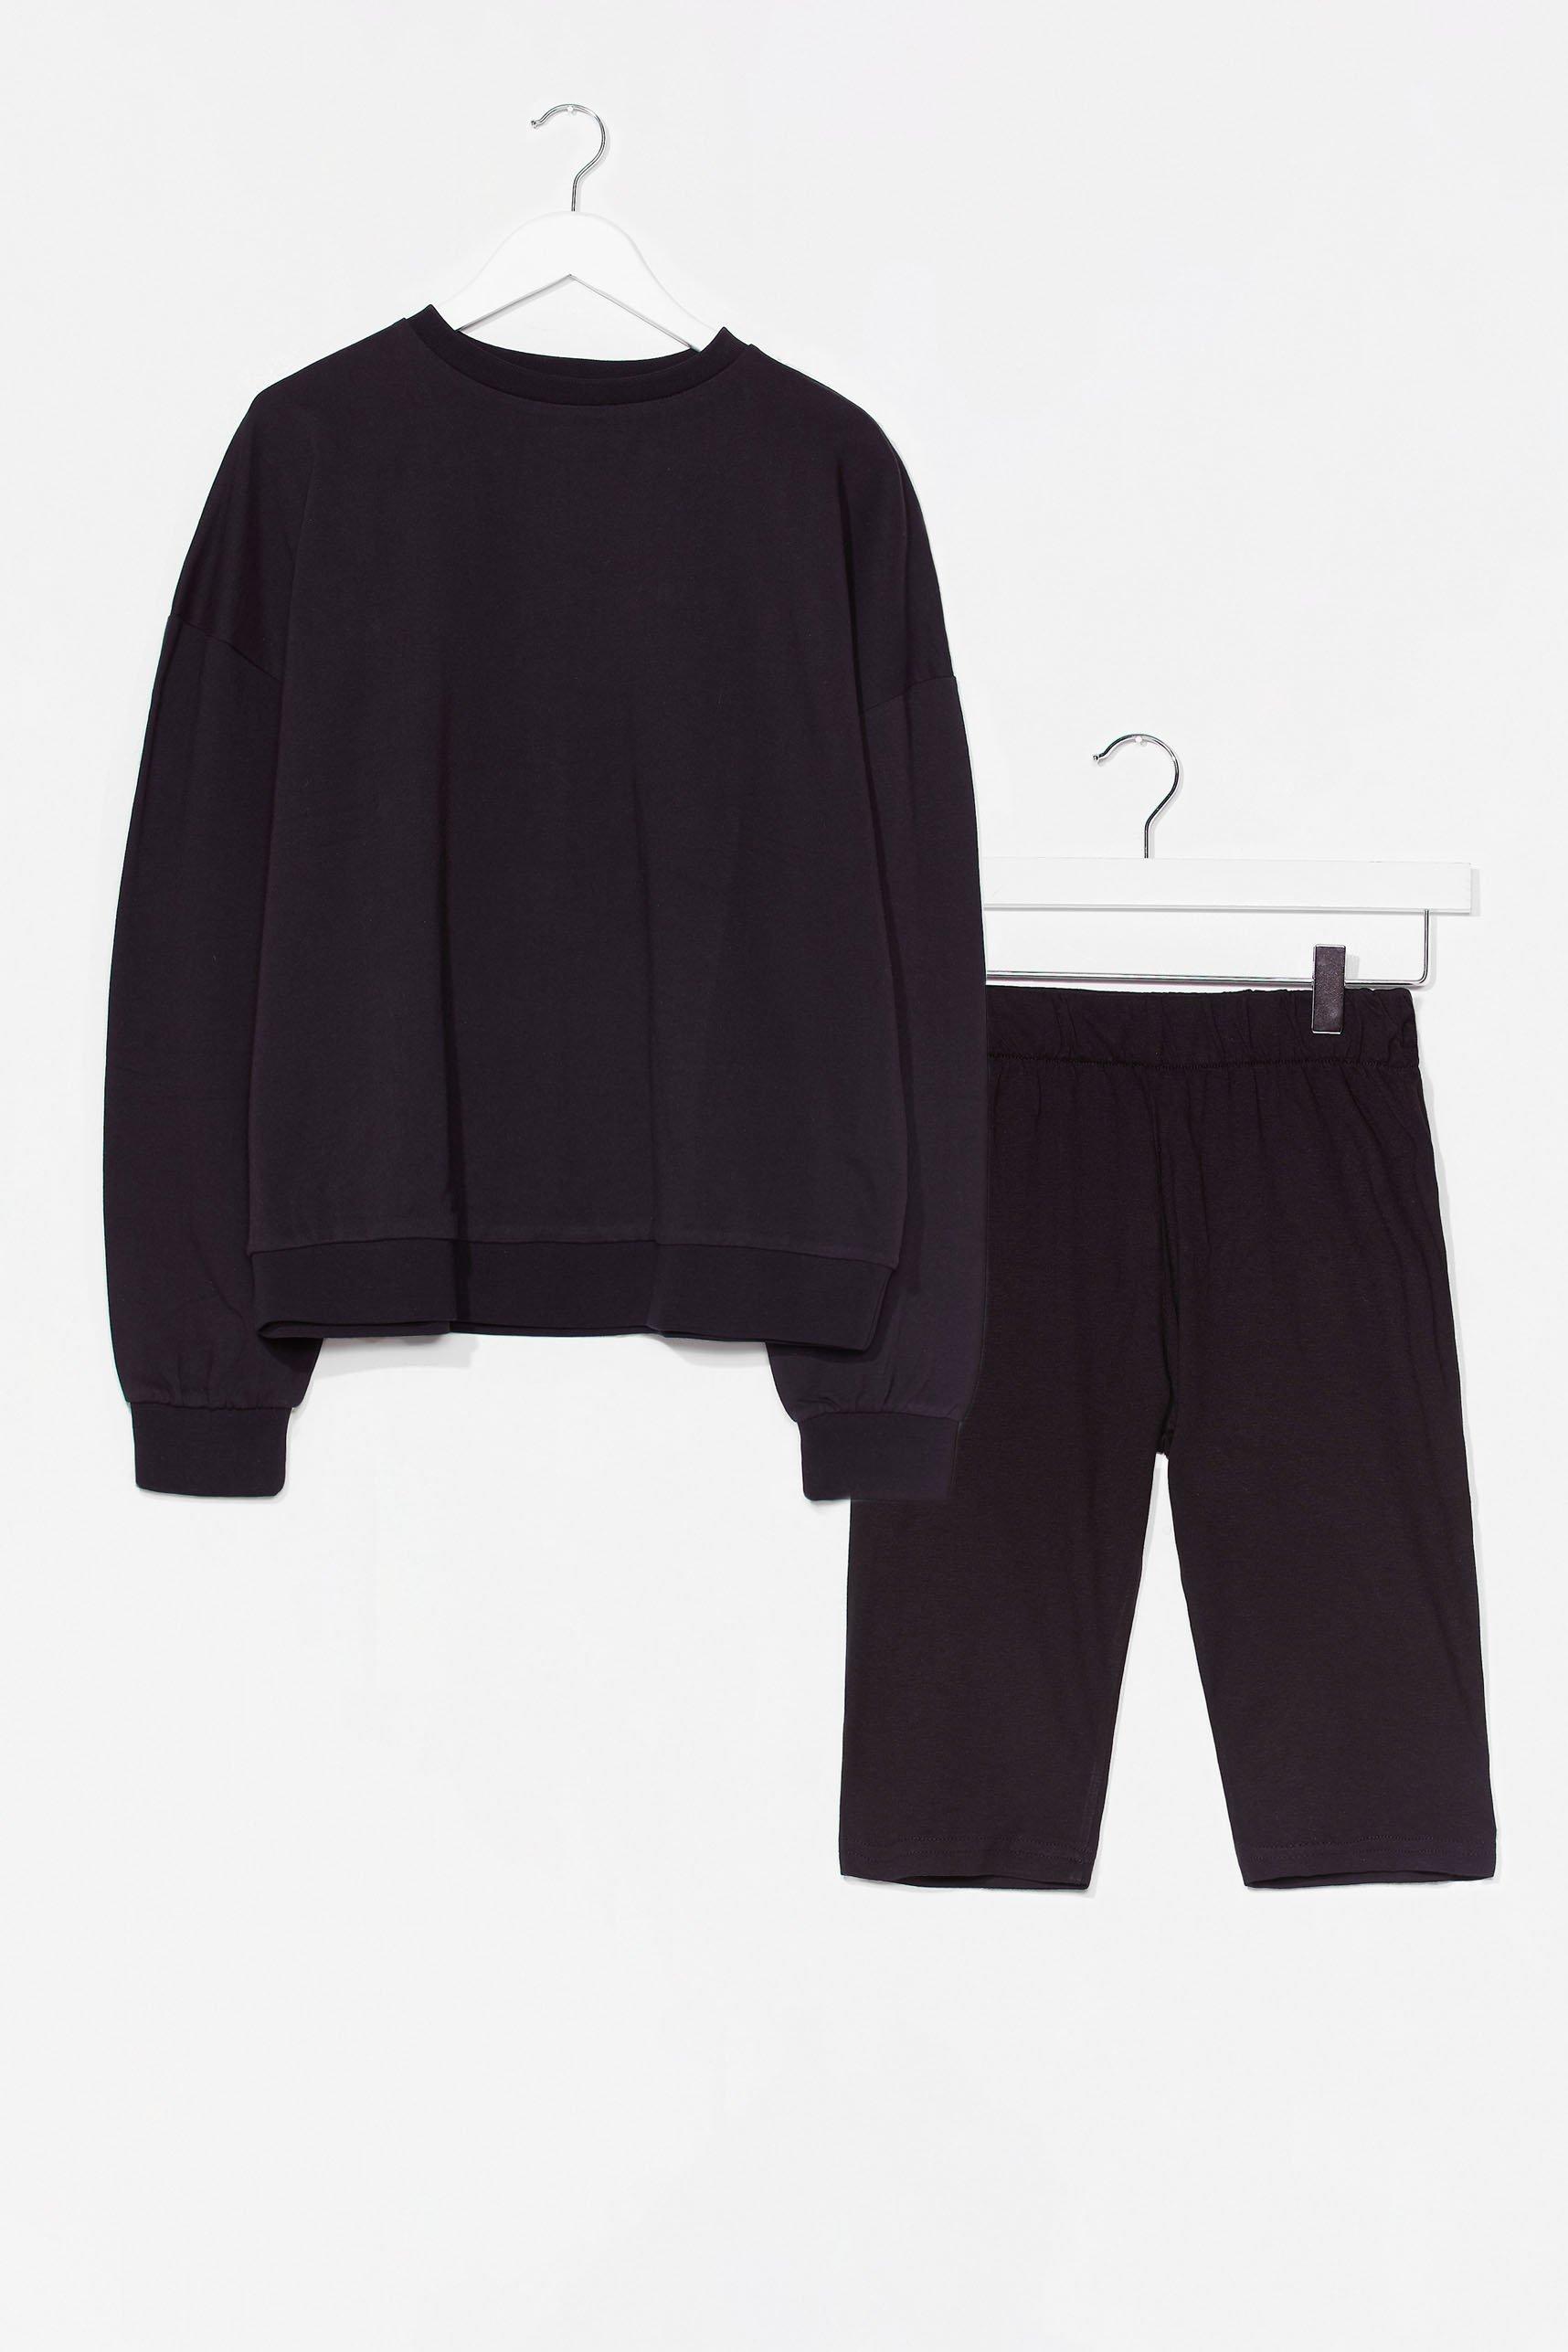 Image of Womens All Together Now Sweatshirt and Biker Short Set - Black